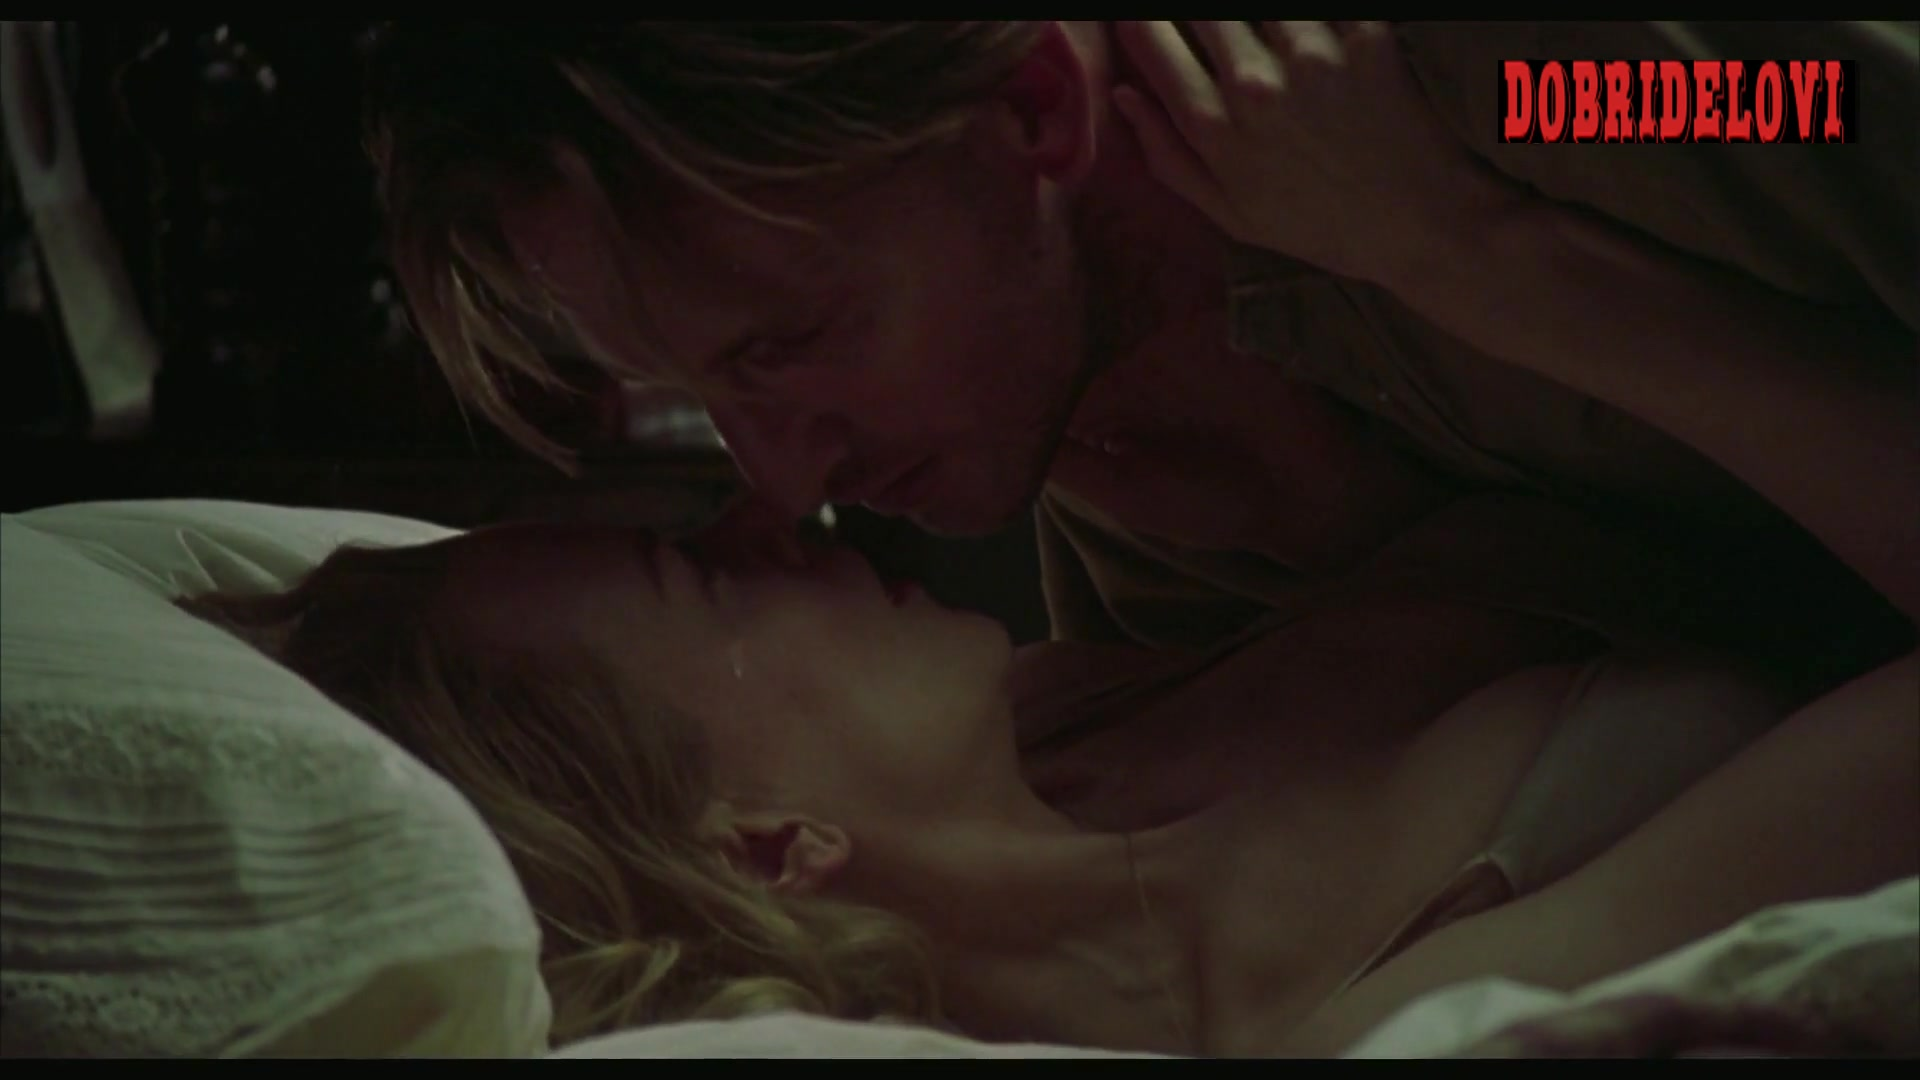 Nicole Kidman pokies scene from The Others